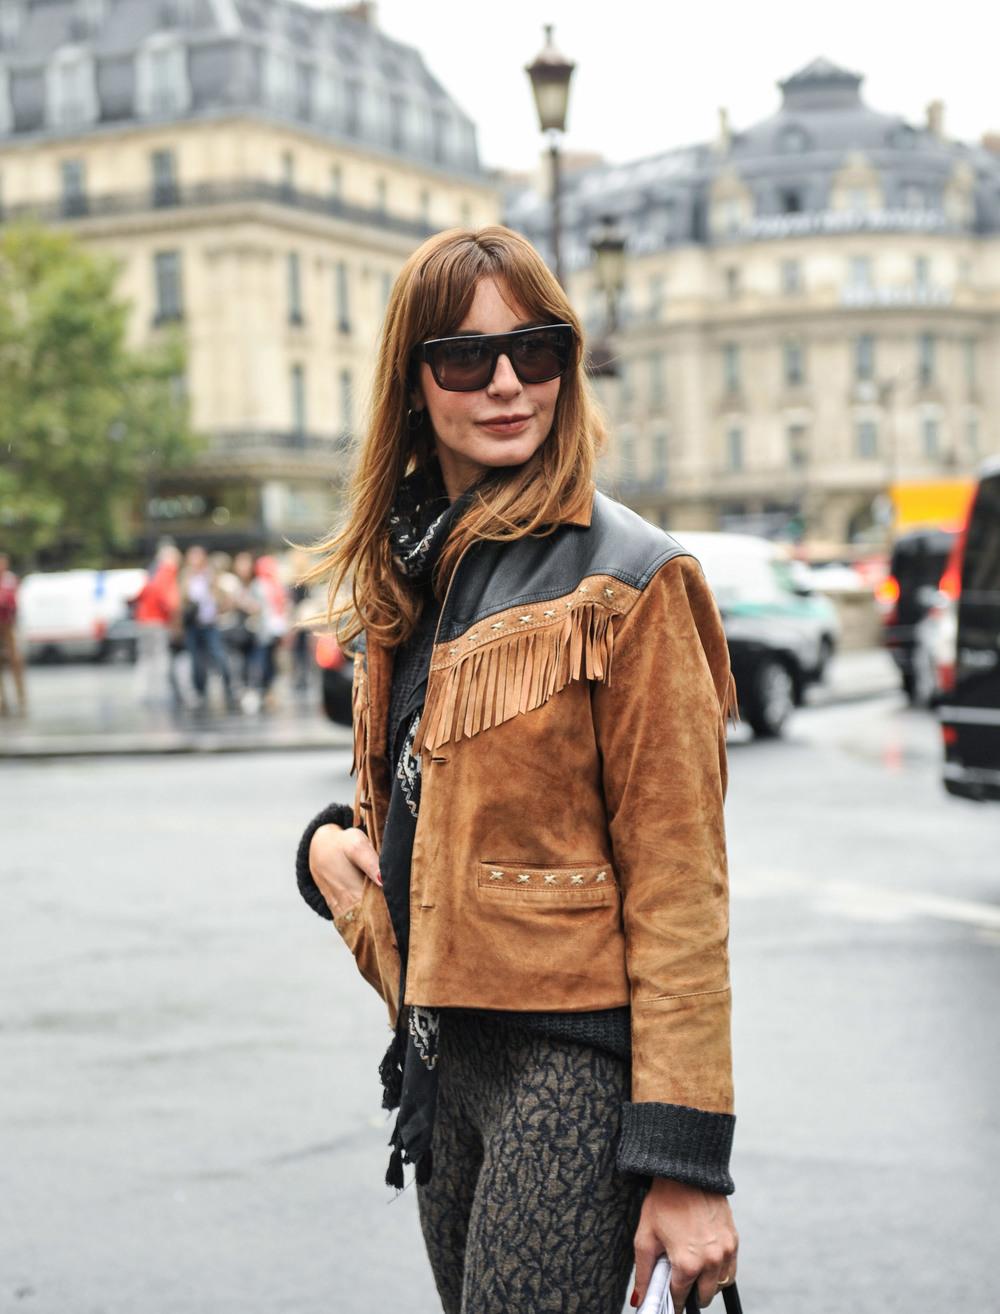 StreetStyle_ParisFashionWeek_LeandroJusten_144.jpg